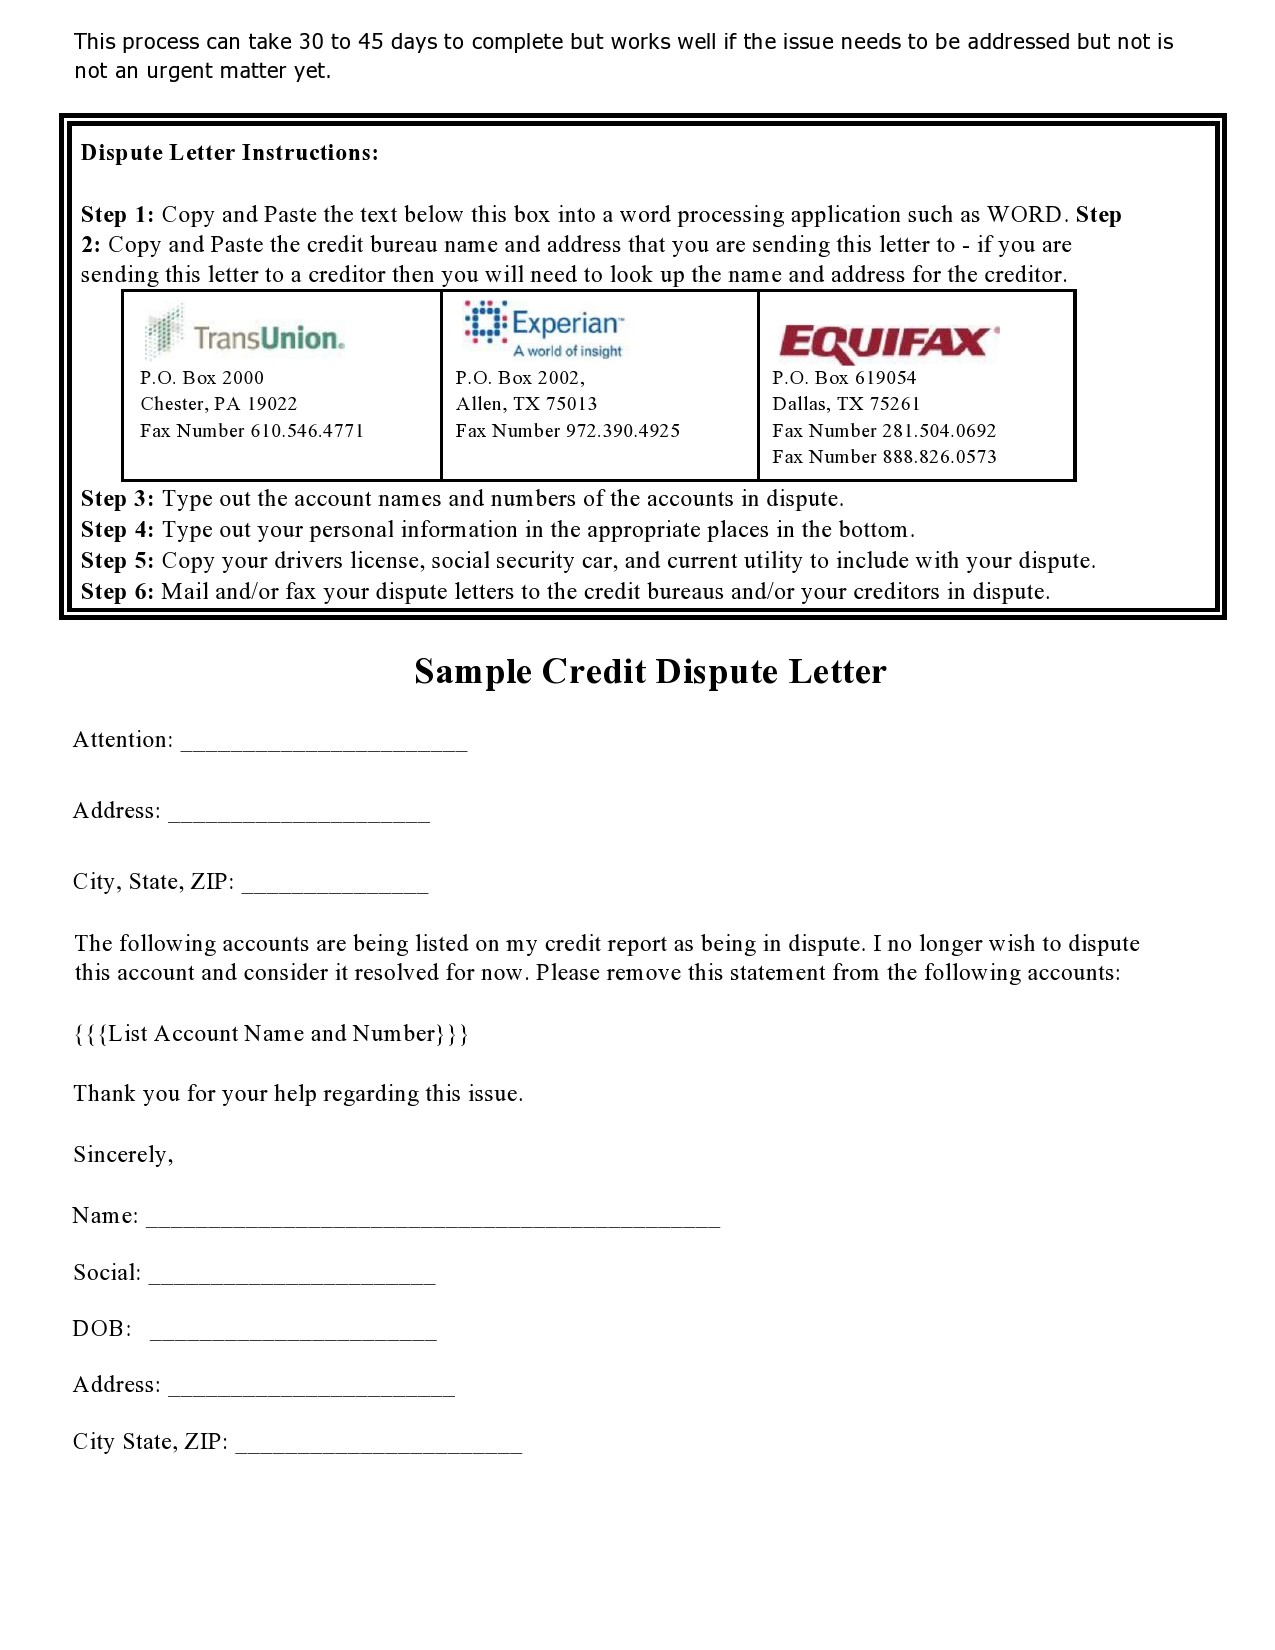 Free credit dispute letter 10